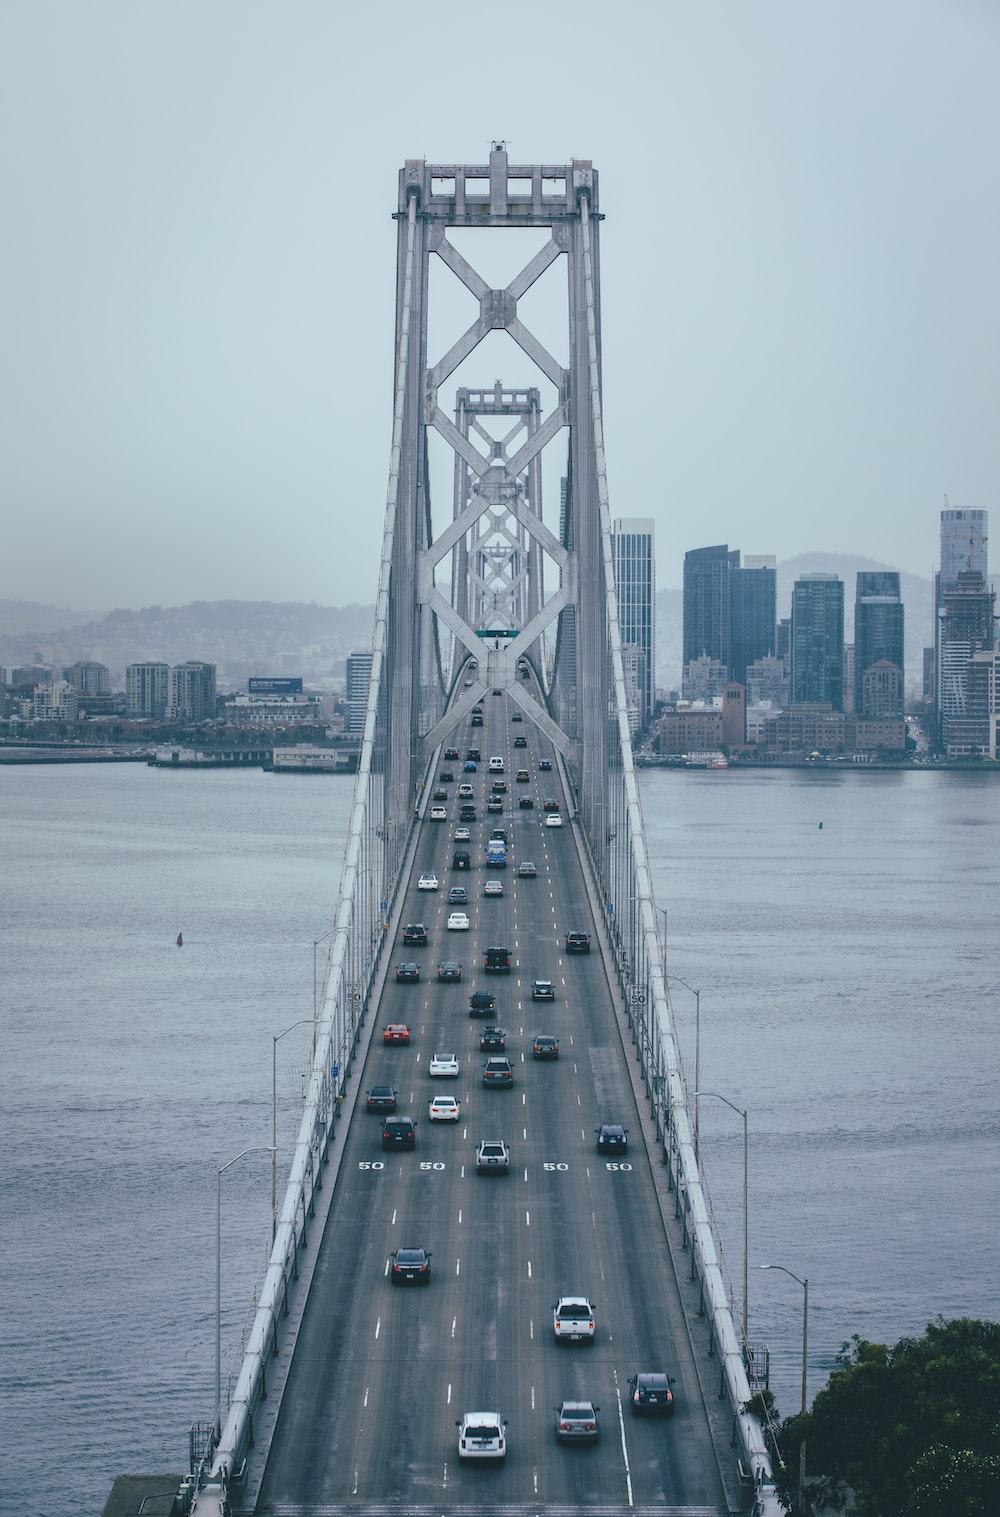 vehicles on bridge at daytime